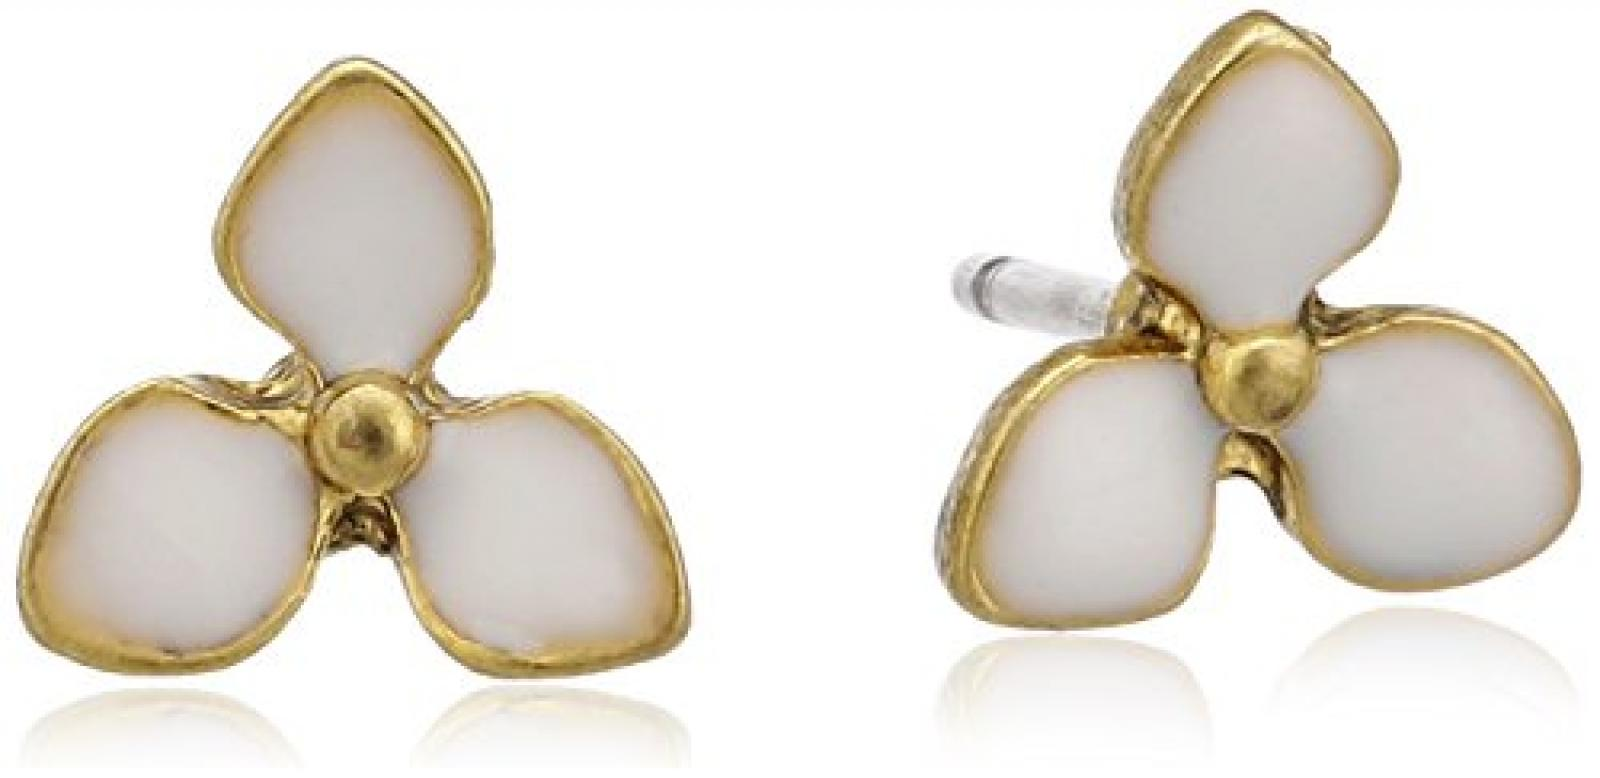 Pilgrim Jewelry Damen-Ohrstecker aus der Serie Classic vergoldet weiss 0.8 cm 611312073